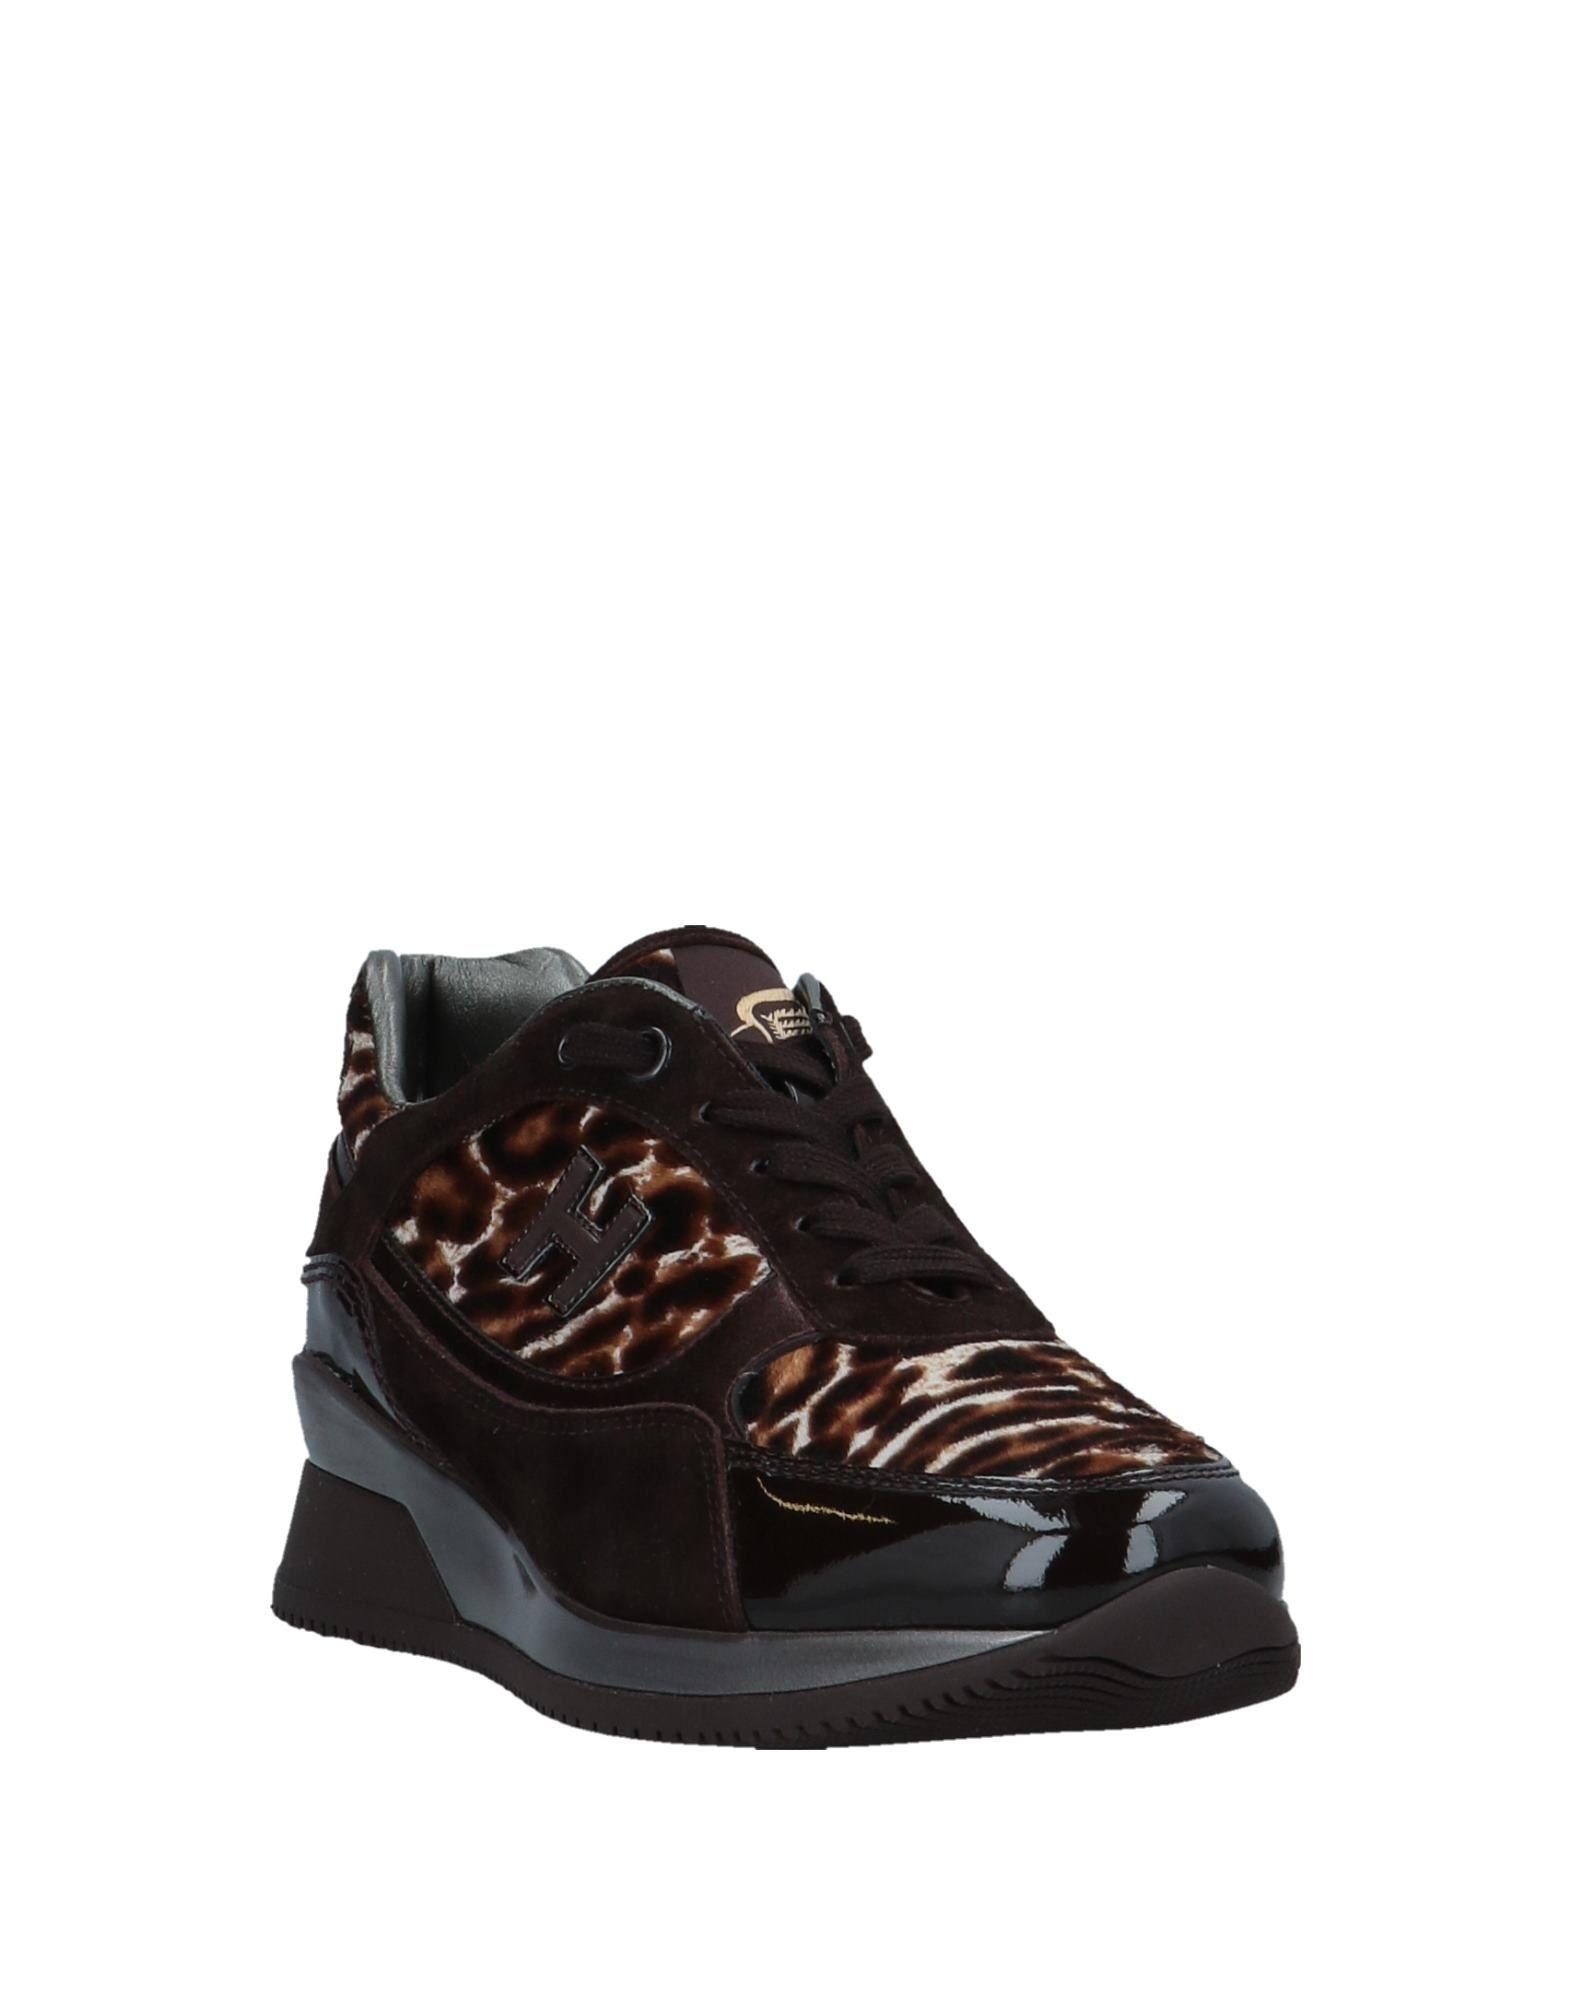 Hogan Sneakers - Women Hogan Sneakers Sneakers Sneakers online on  United Kingdom - 11539282RL 07b2cf